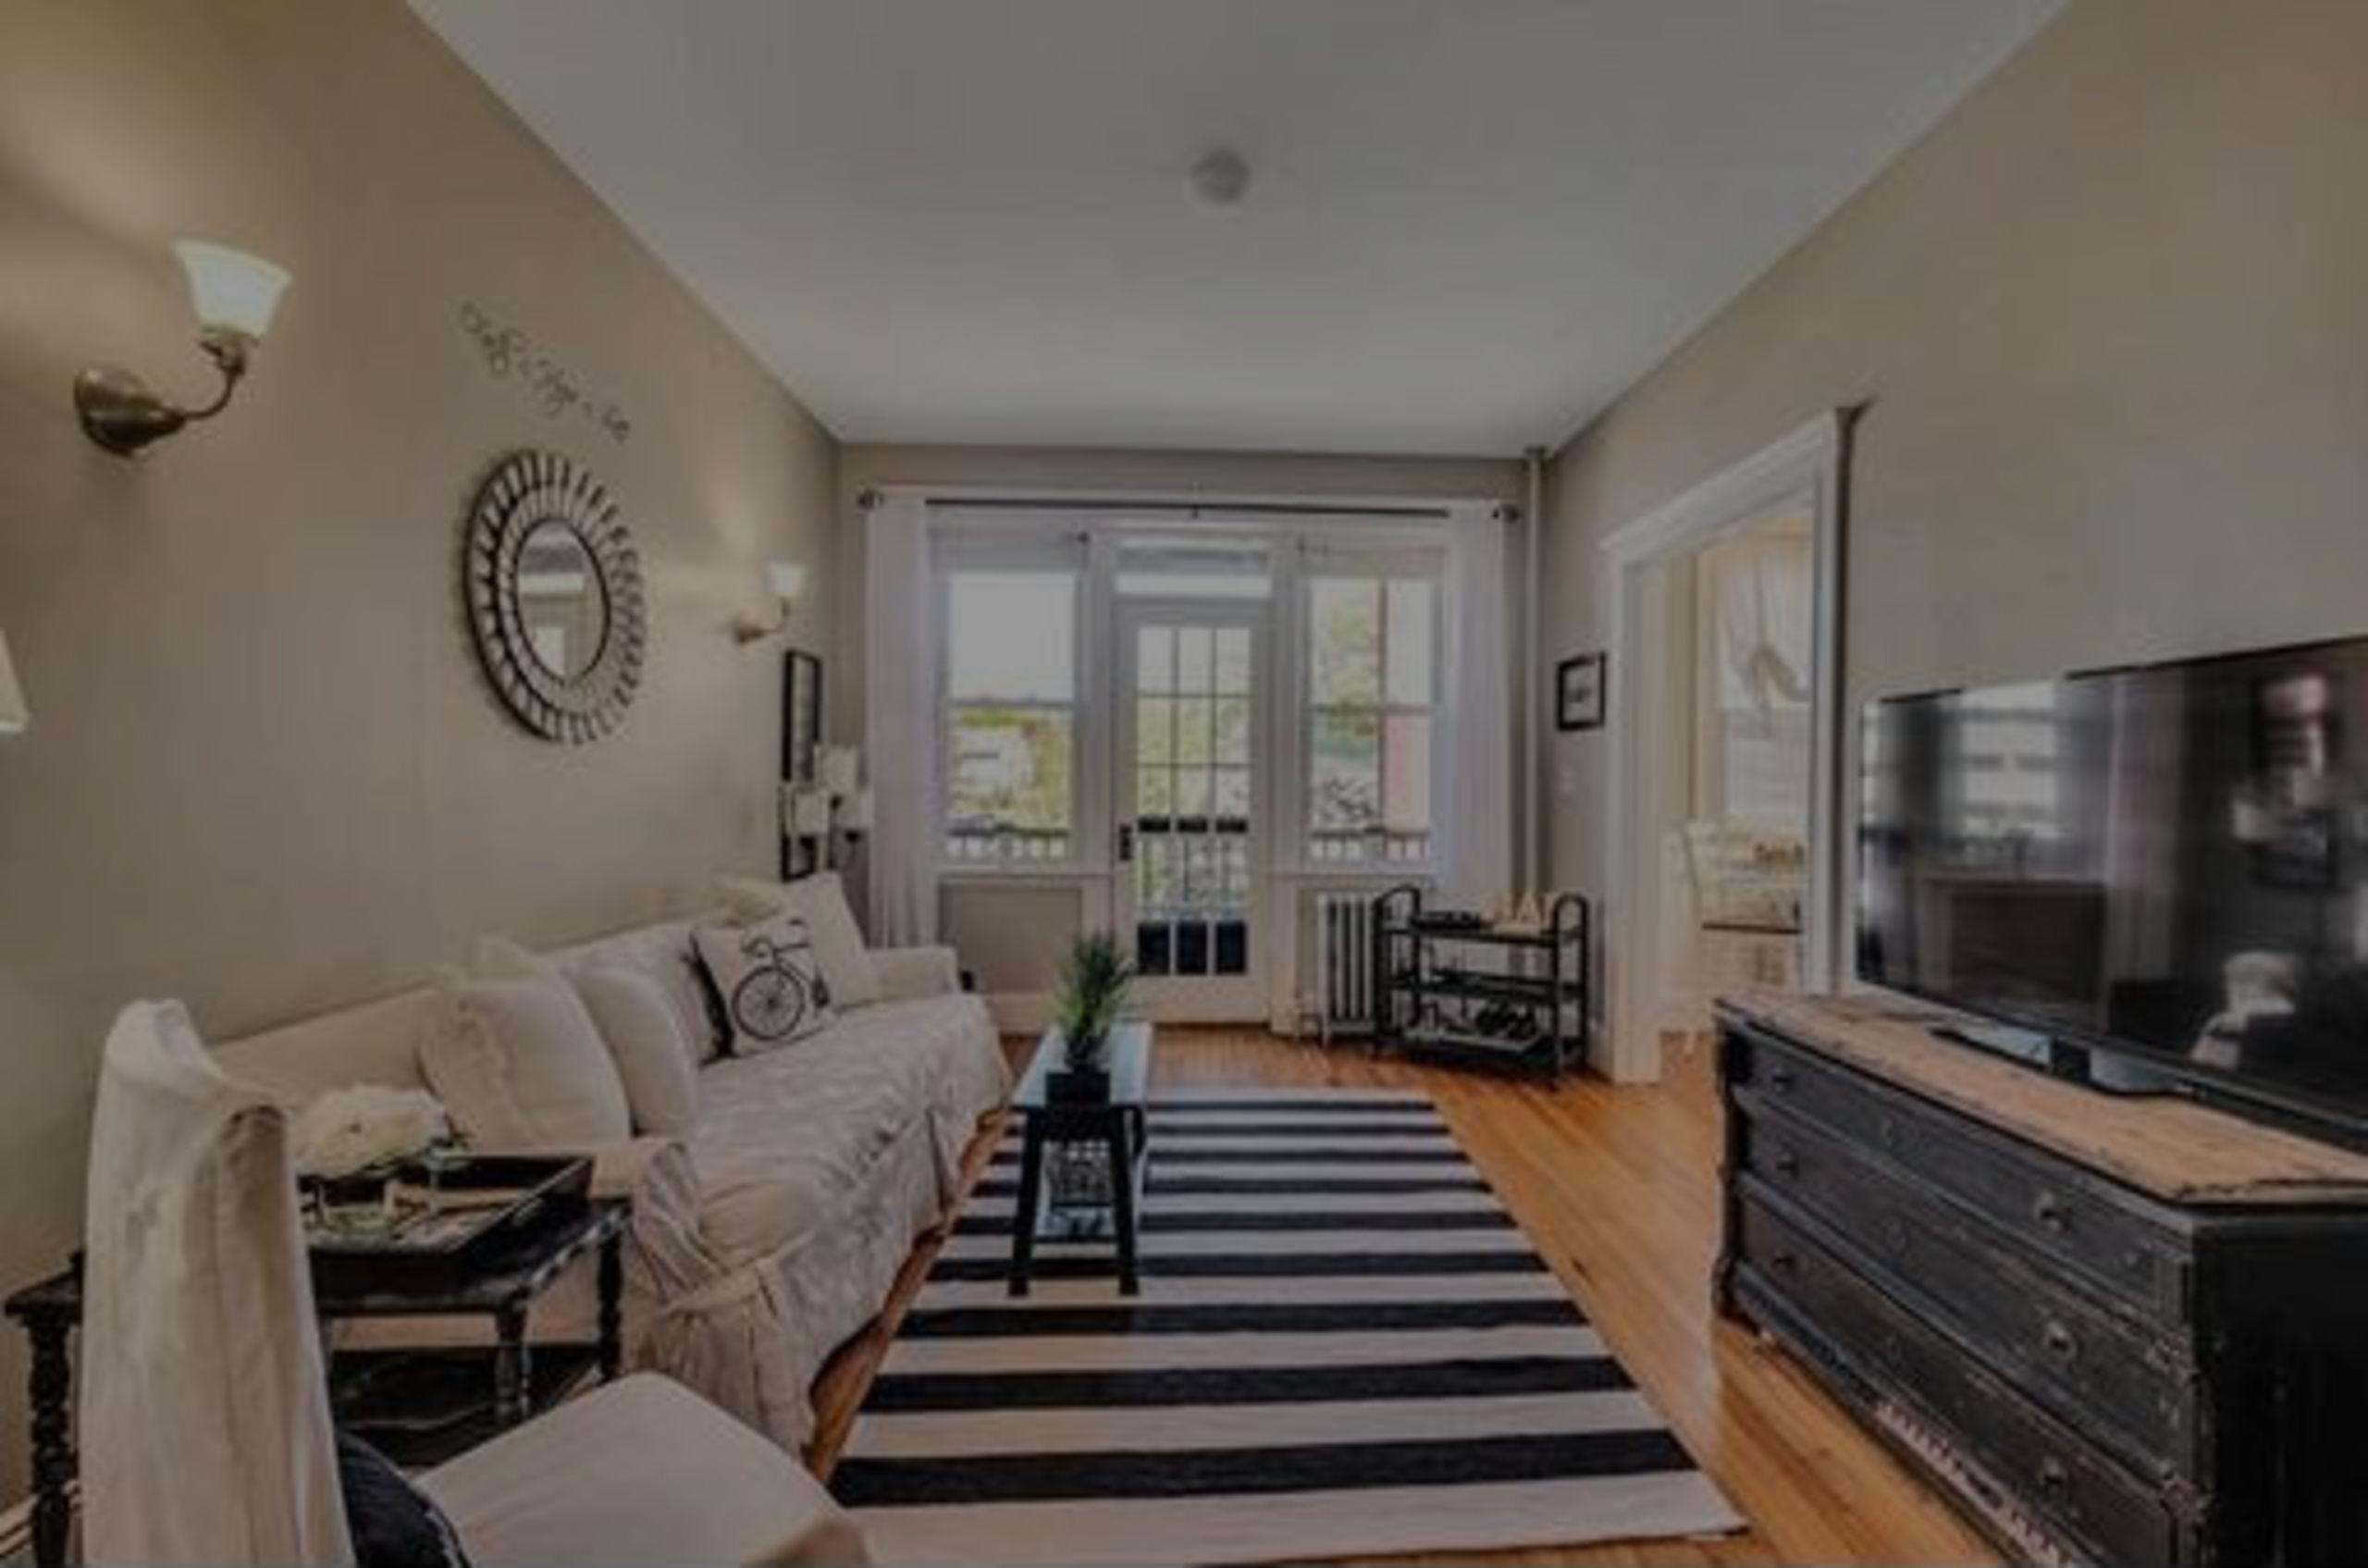 5 Apartments for Rent in Jamaica Plain: $2500 & Under